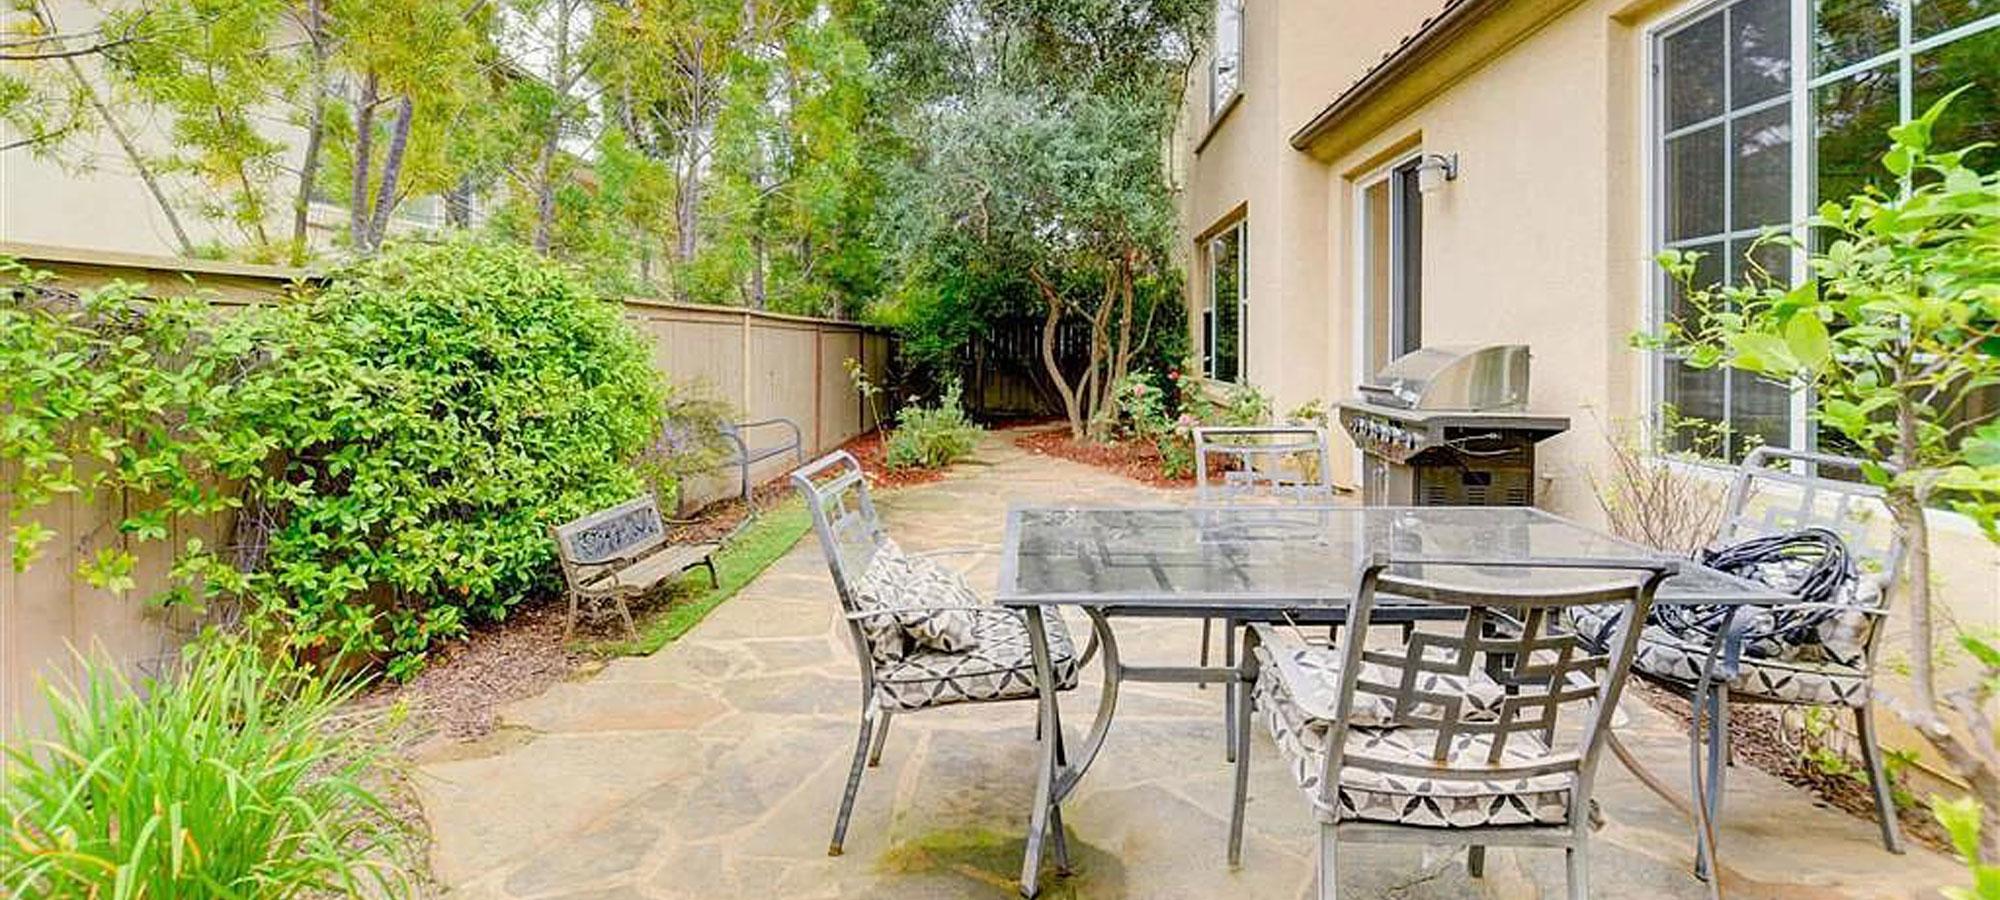 15645 Via Montecristo, San Diego, CA 92127